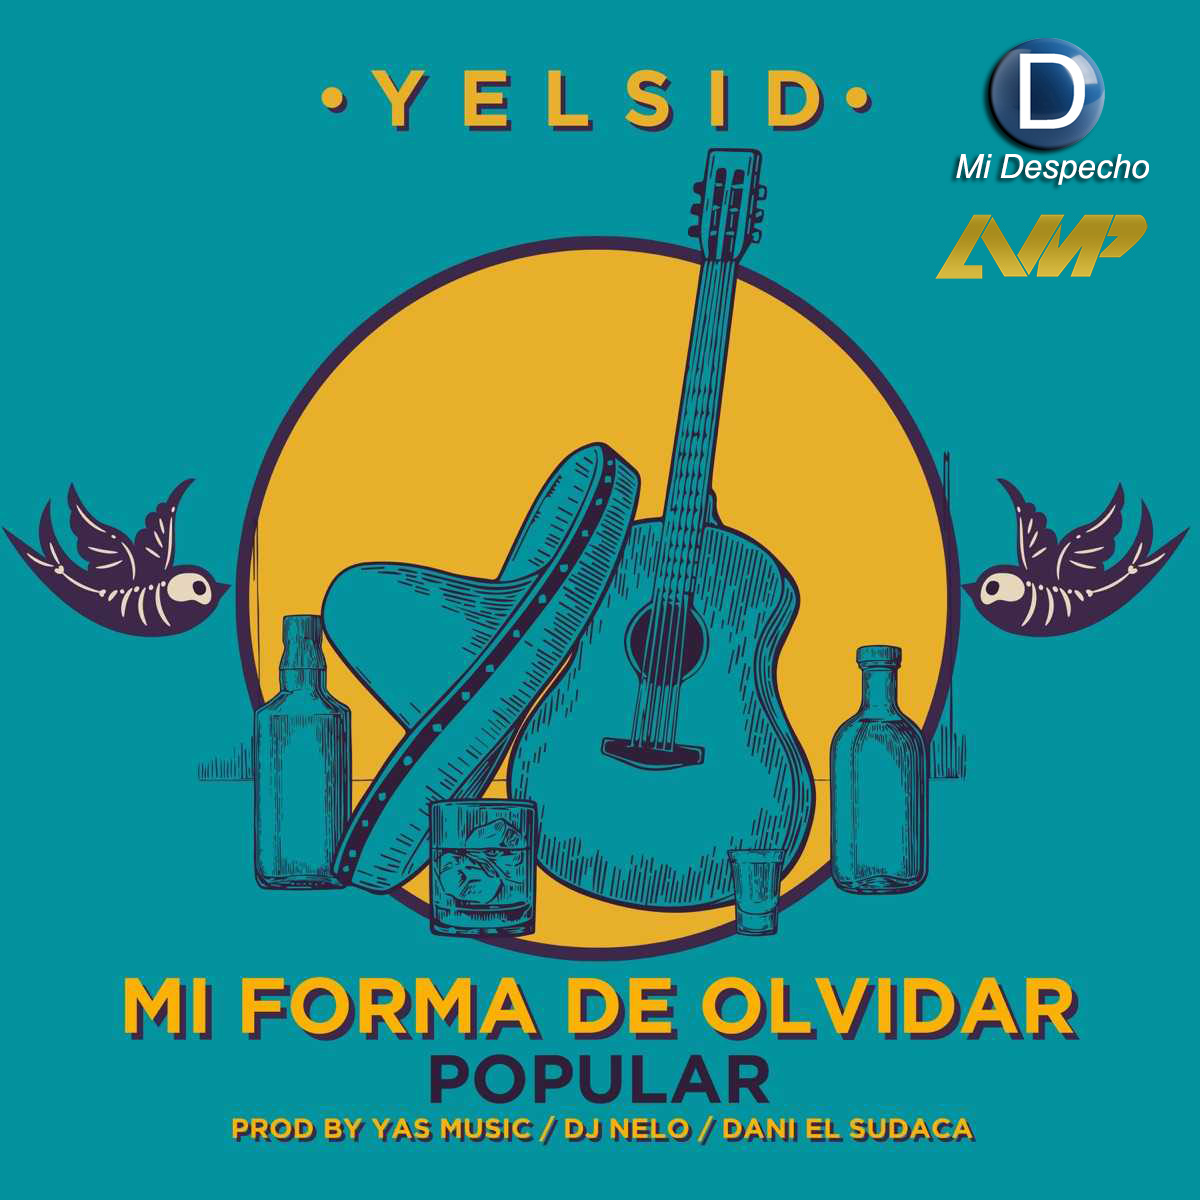 Yelsid Mi Forma De Olvidar Frontal